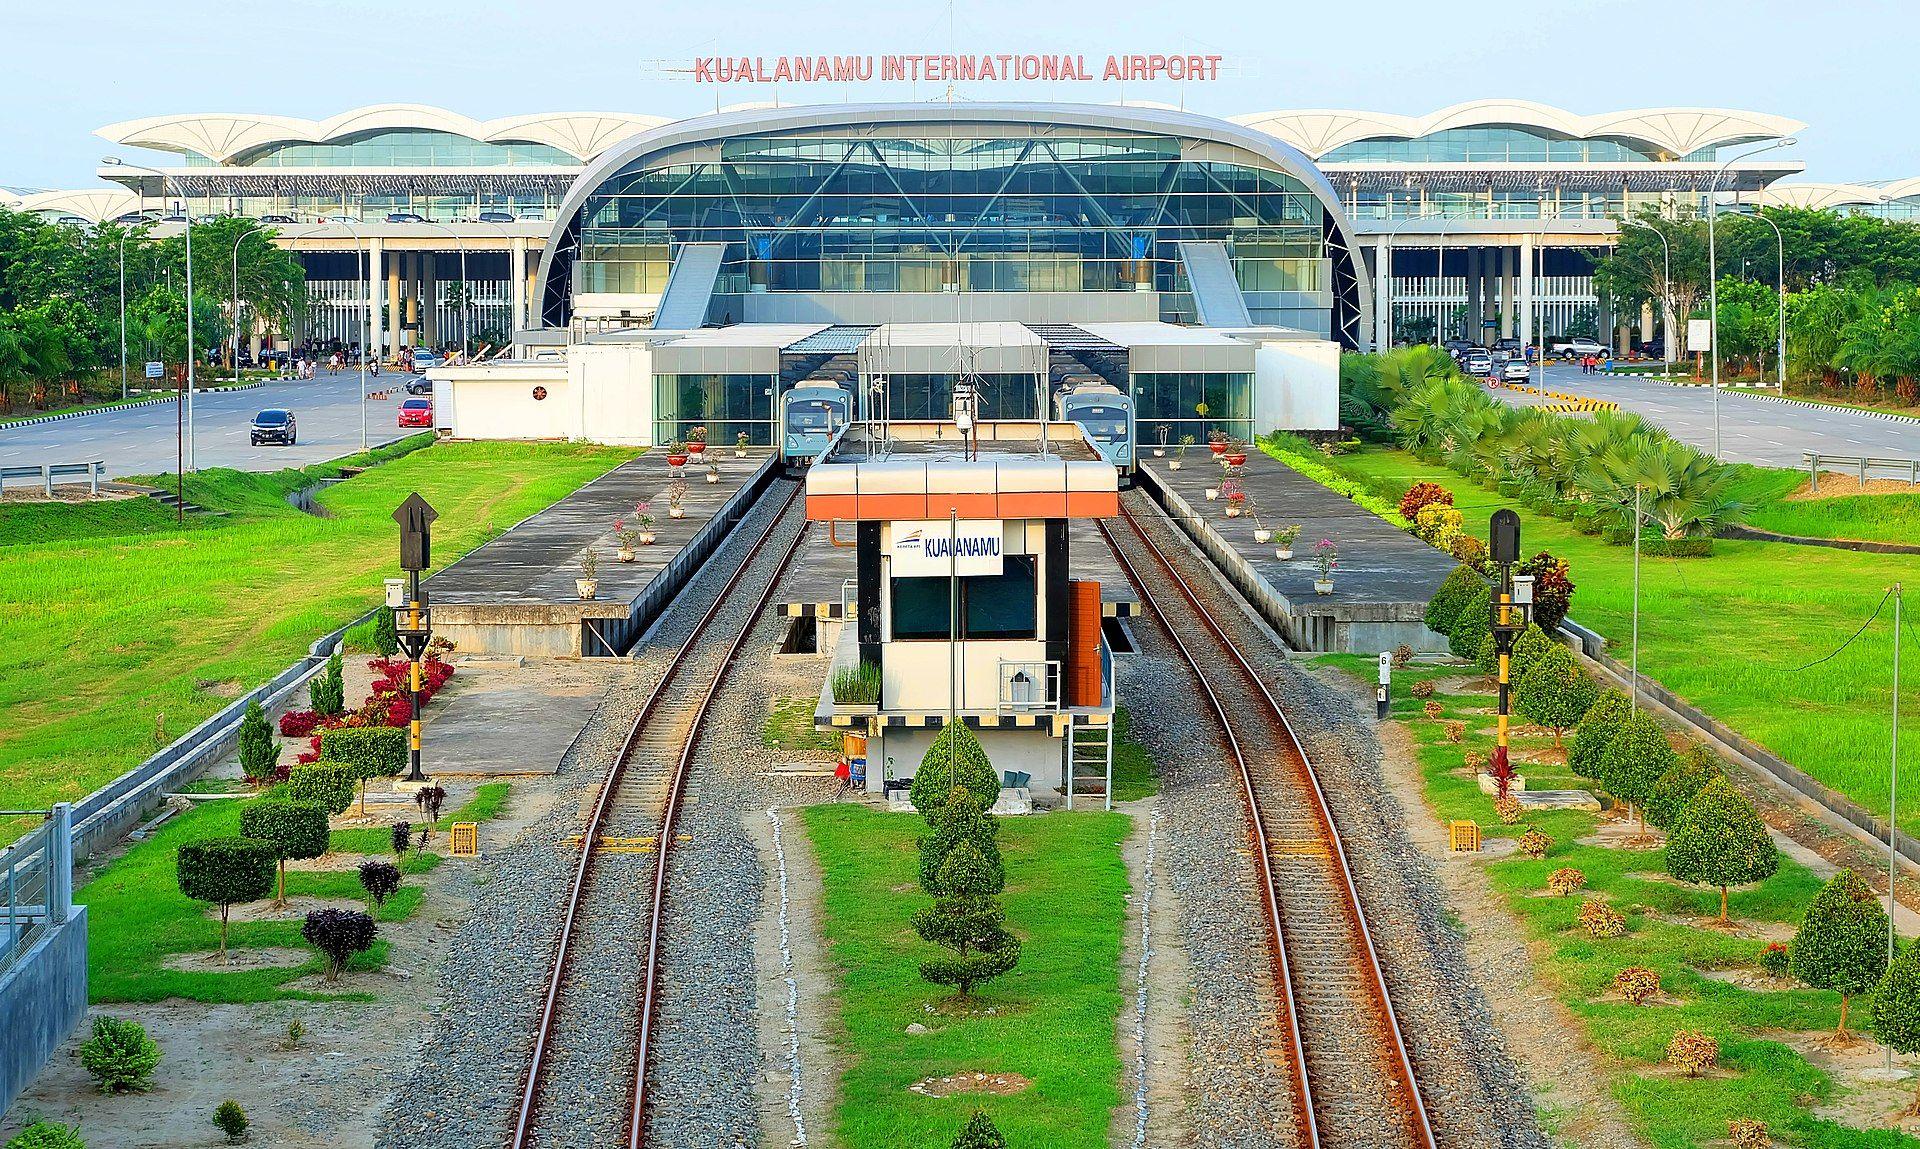 Bandar Udara Internasional Kualanamu International Airport Medan